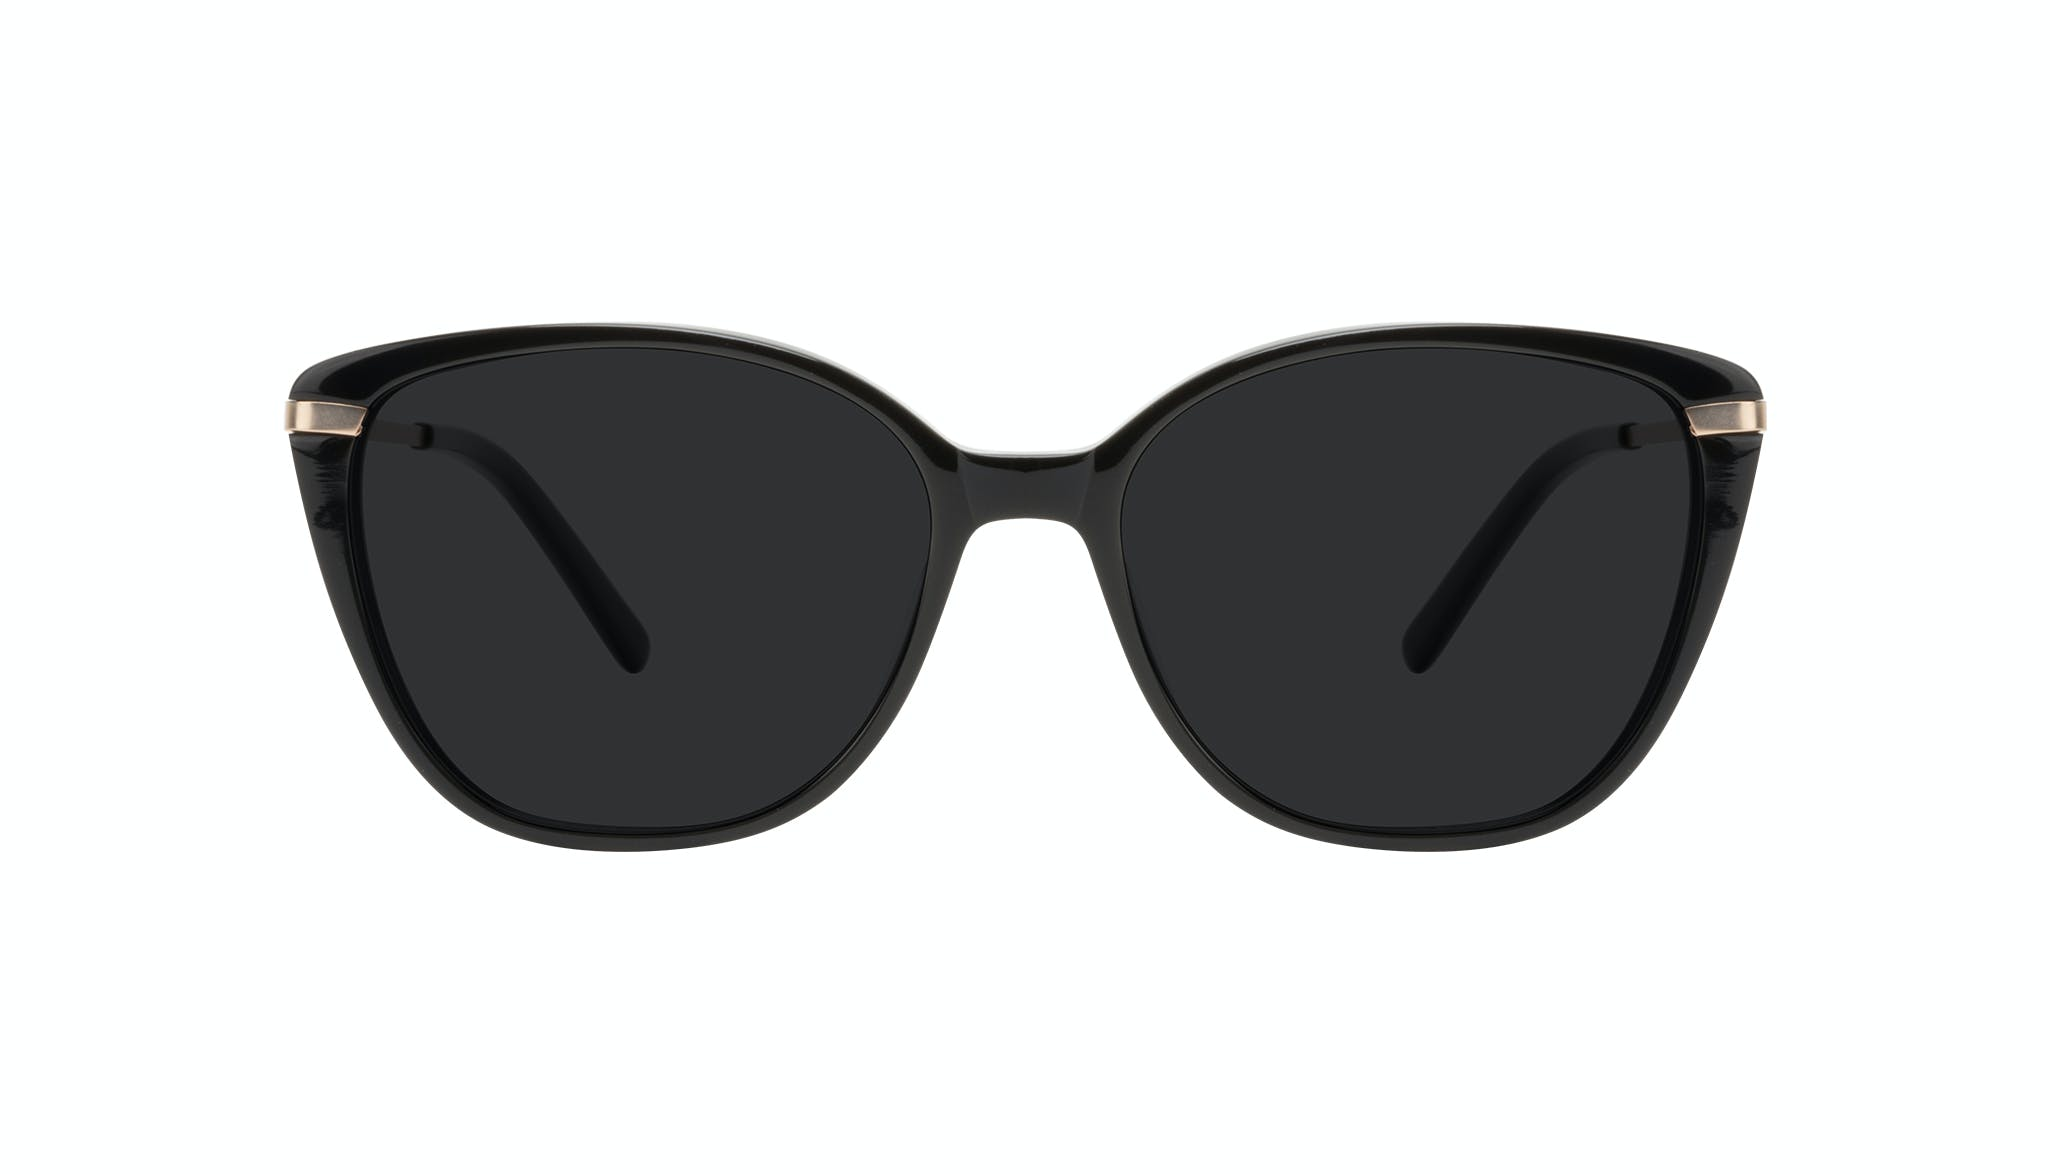 Affordable Fashion Glasses Cat Eye Rectangle Square Sunglasses Women Illusion Onyx Front